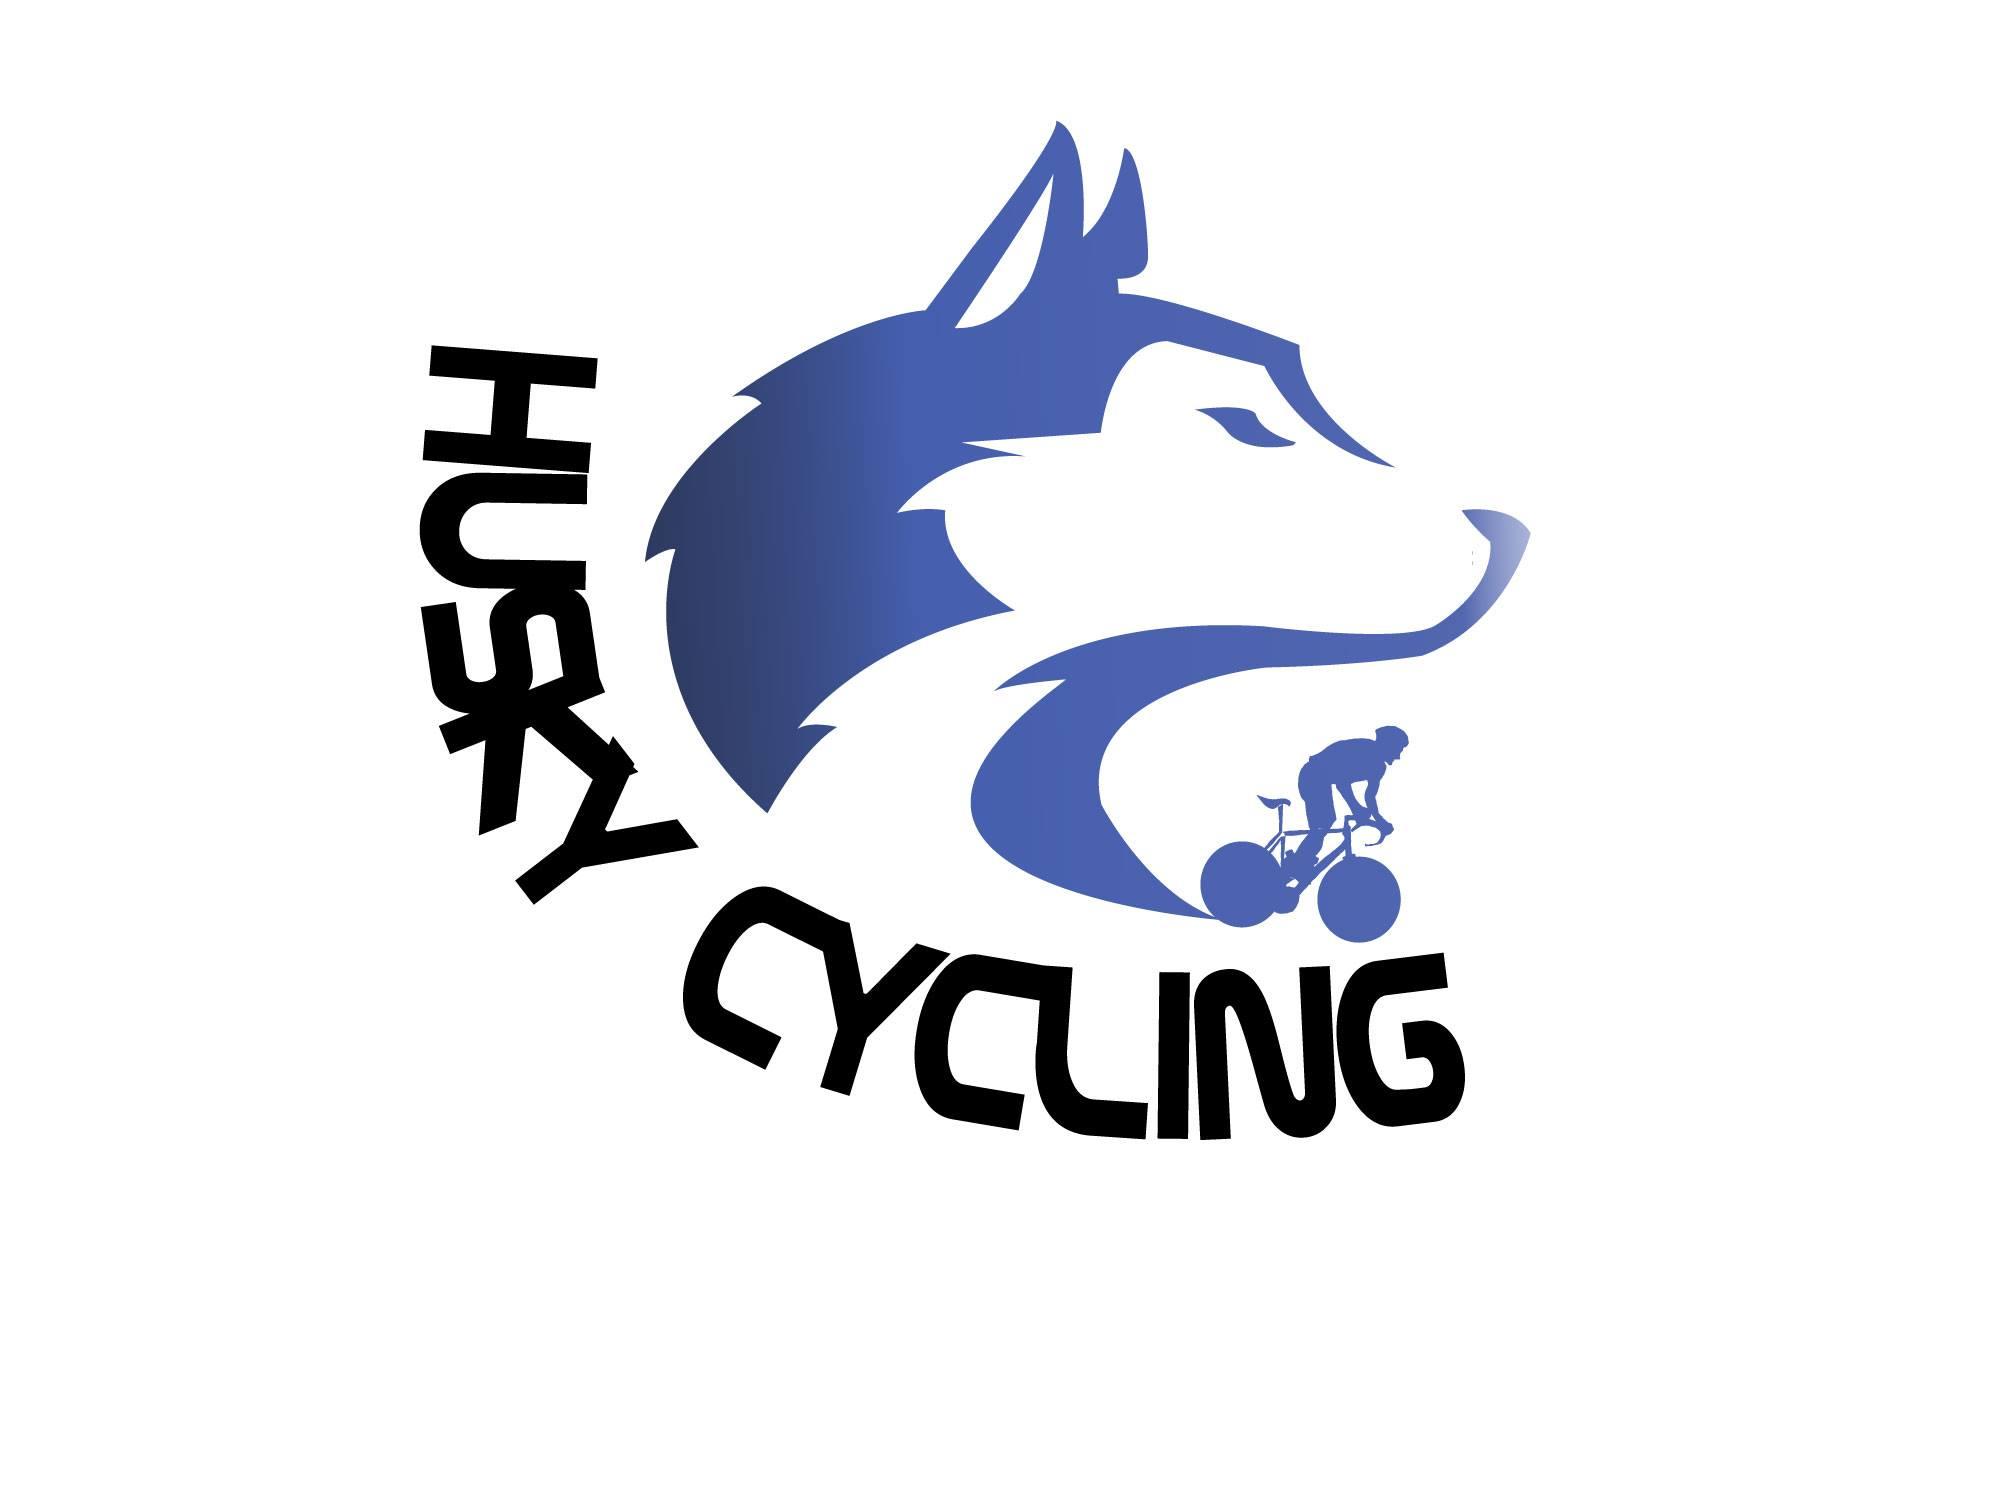 husky_cycling_logo.jpg